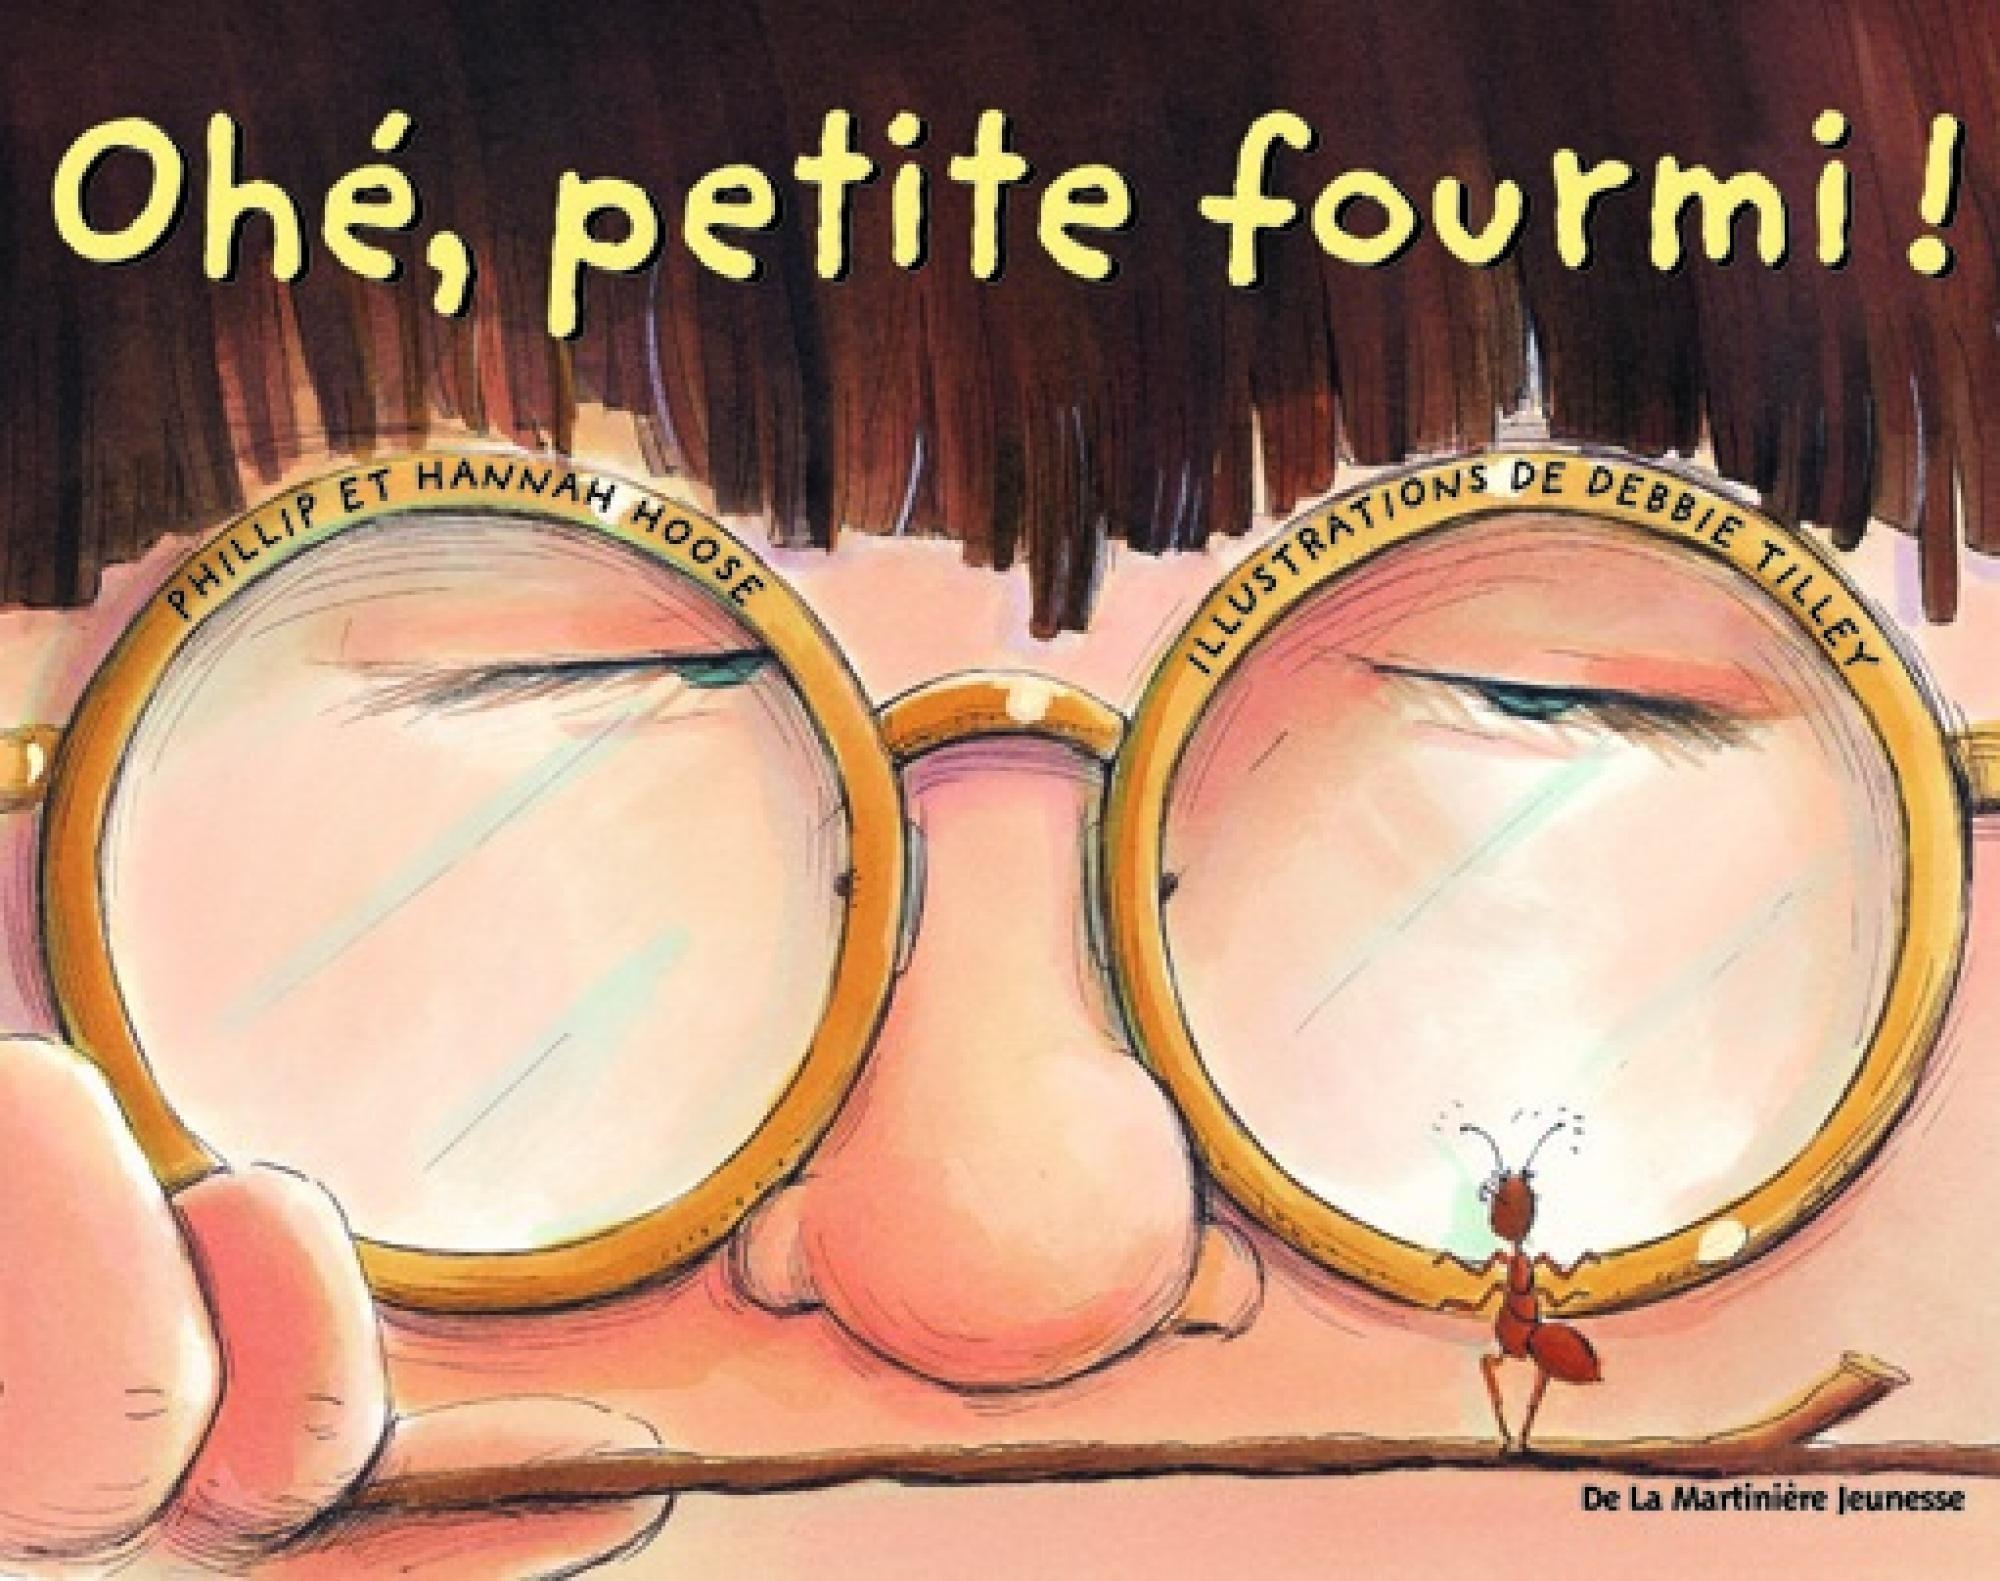 Auteurs phillip et hannah hoose illustratrice debbie tilley de la martini re jeunesse voici - La martiniere jeunesse ...